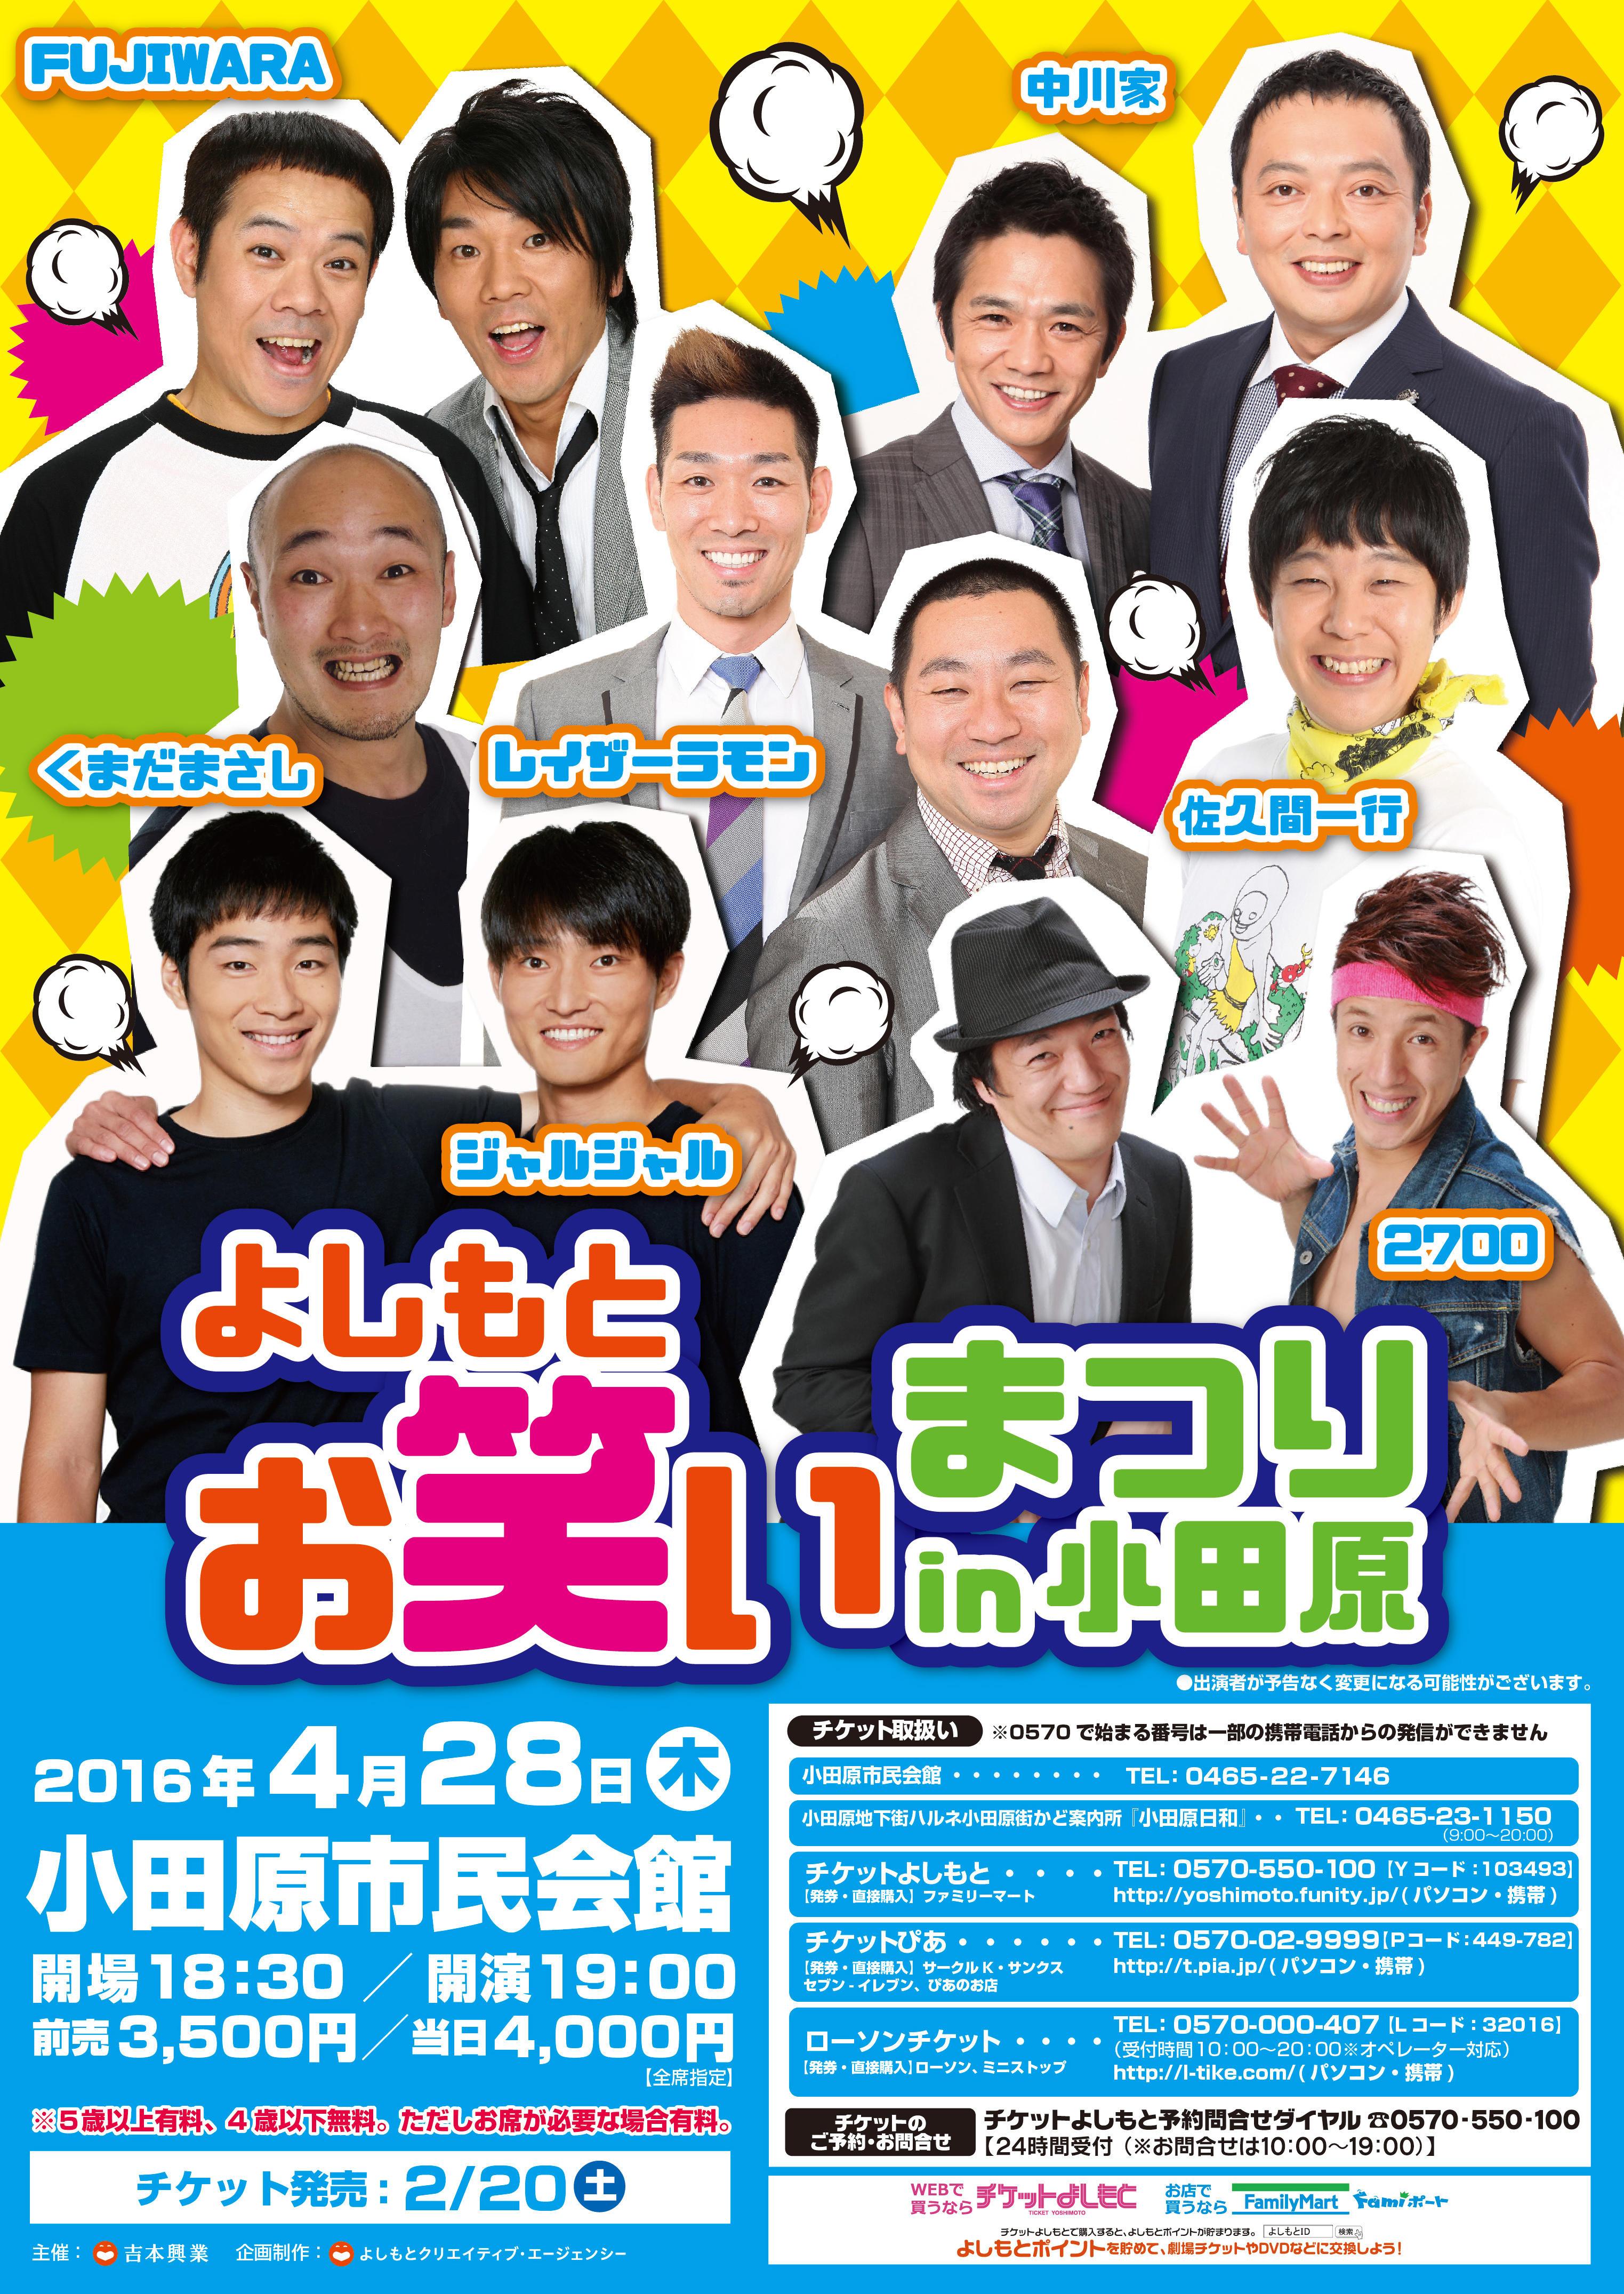 http://www.syumatsu.jp/20160218022202-1b802f439c0abacf3a2e5a49c569ba4193298793.jpg